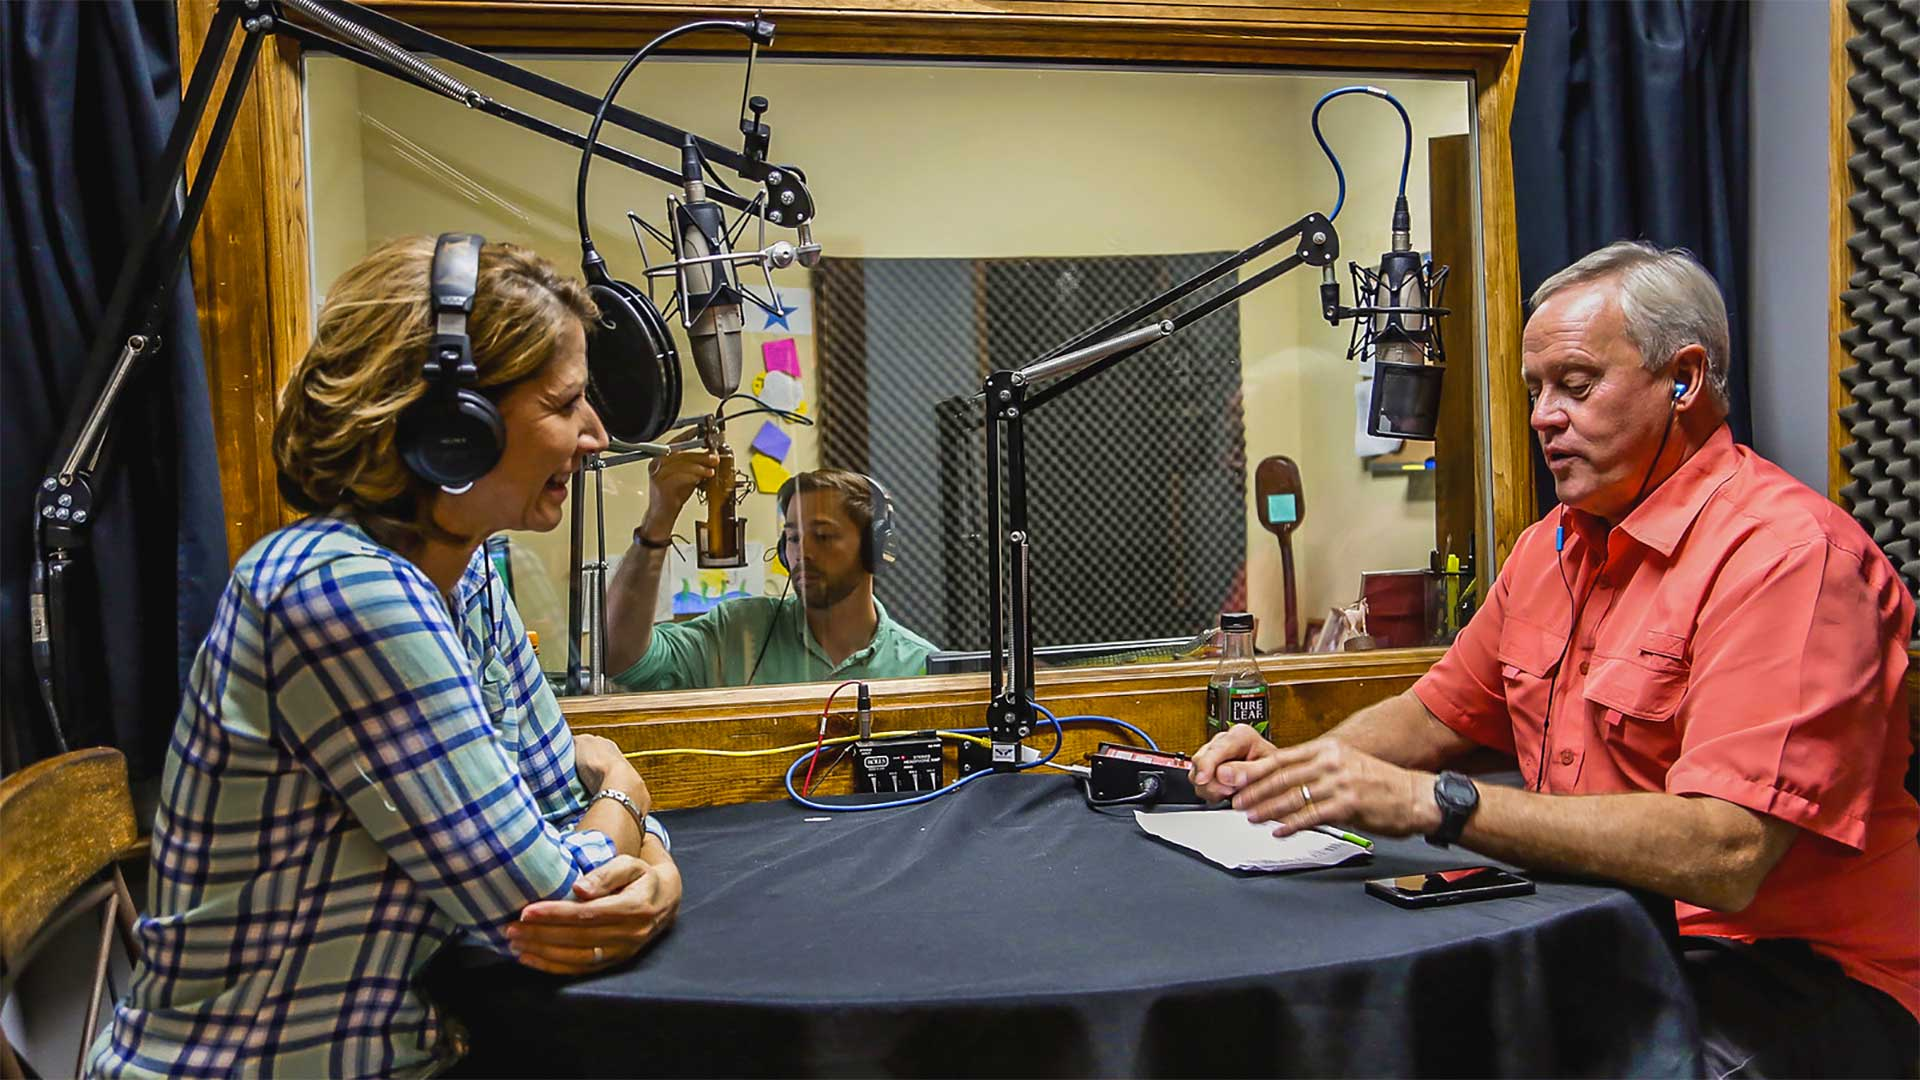 Jodi Marks talks with Danny Lipford in the radio booth